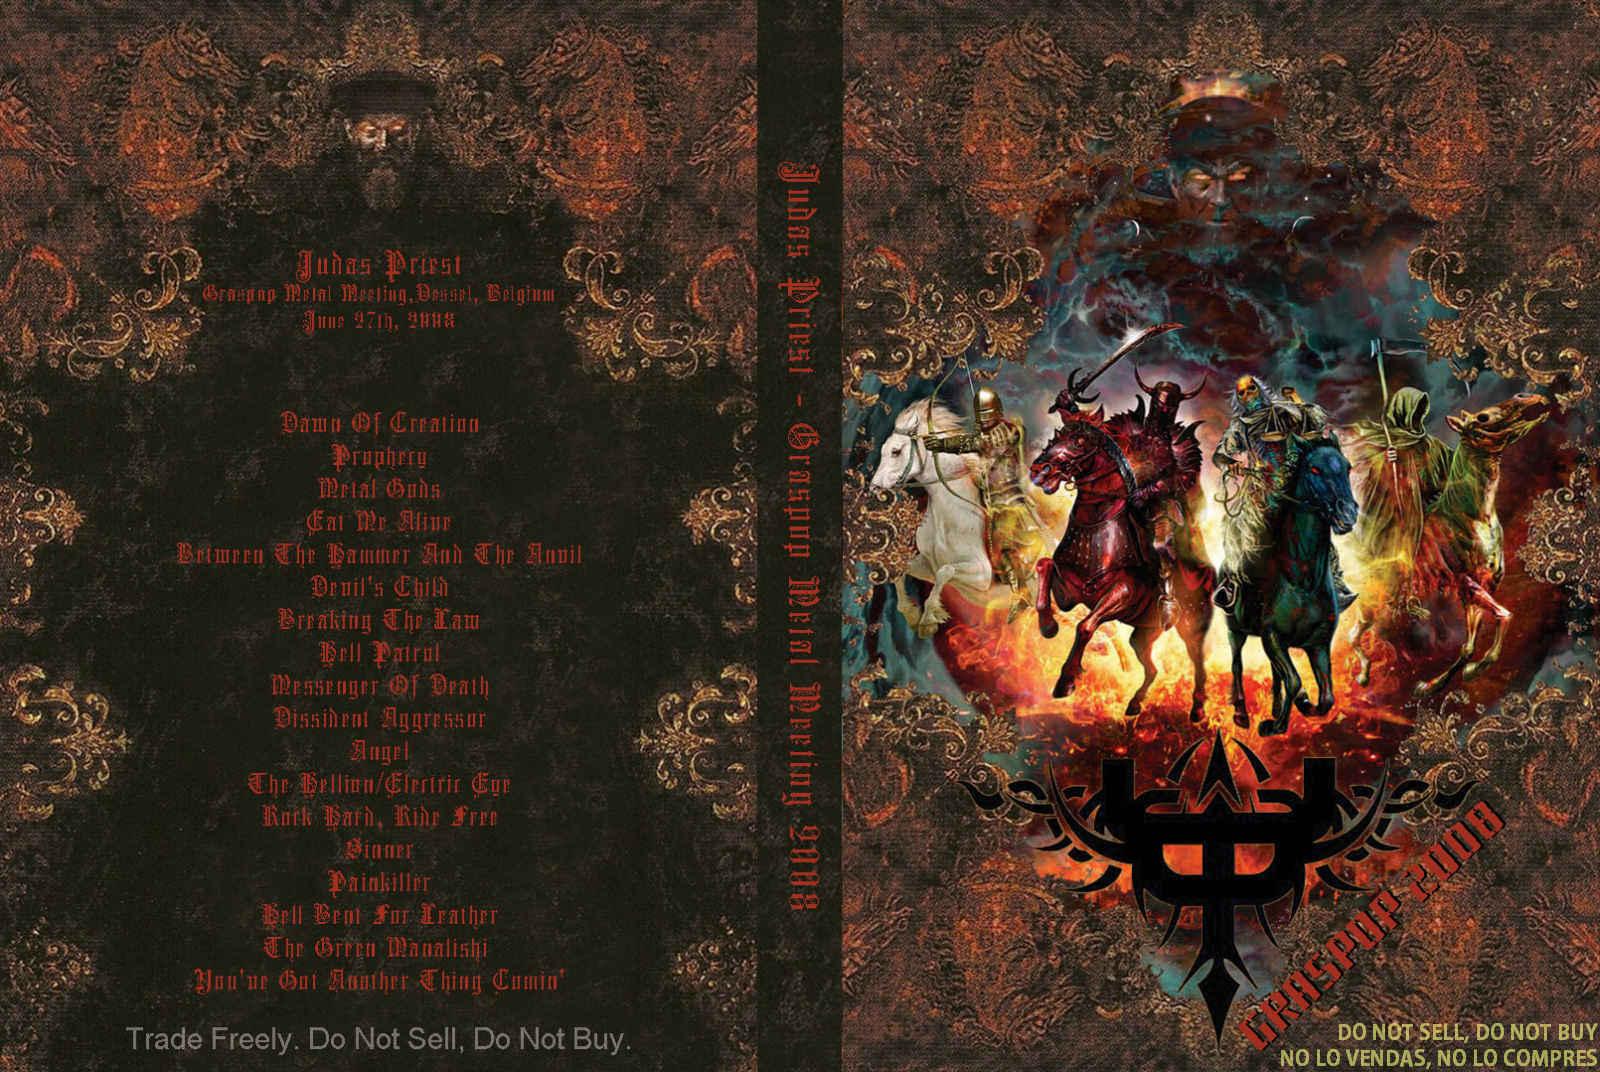 Judas Priest Sinner Pecador